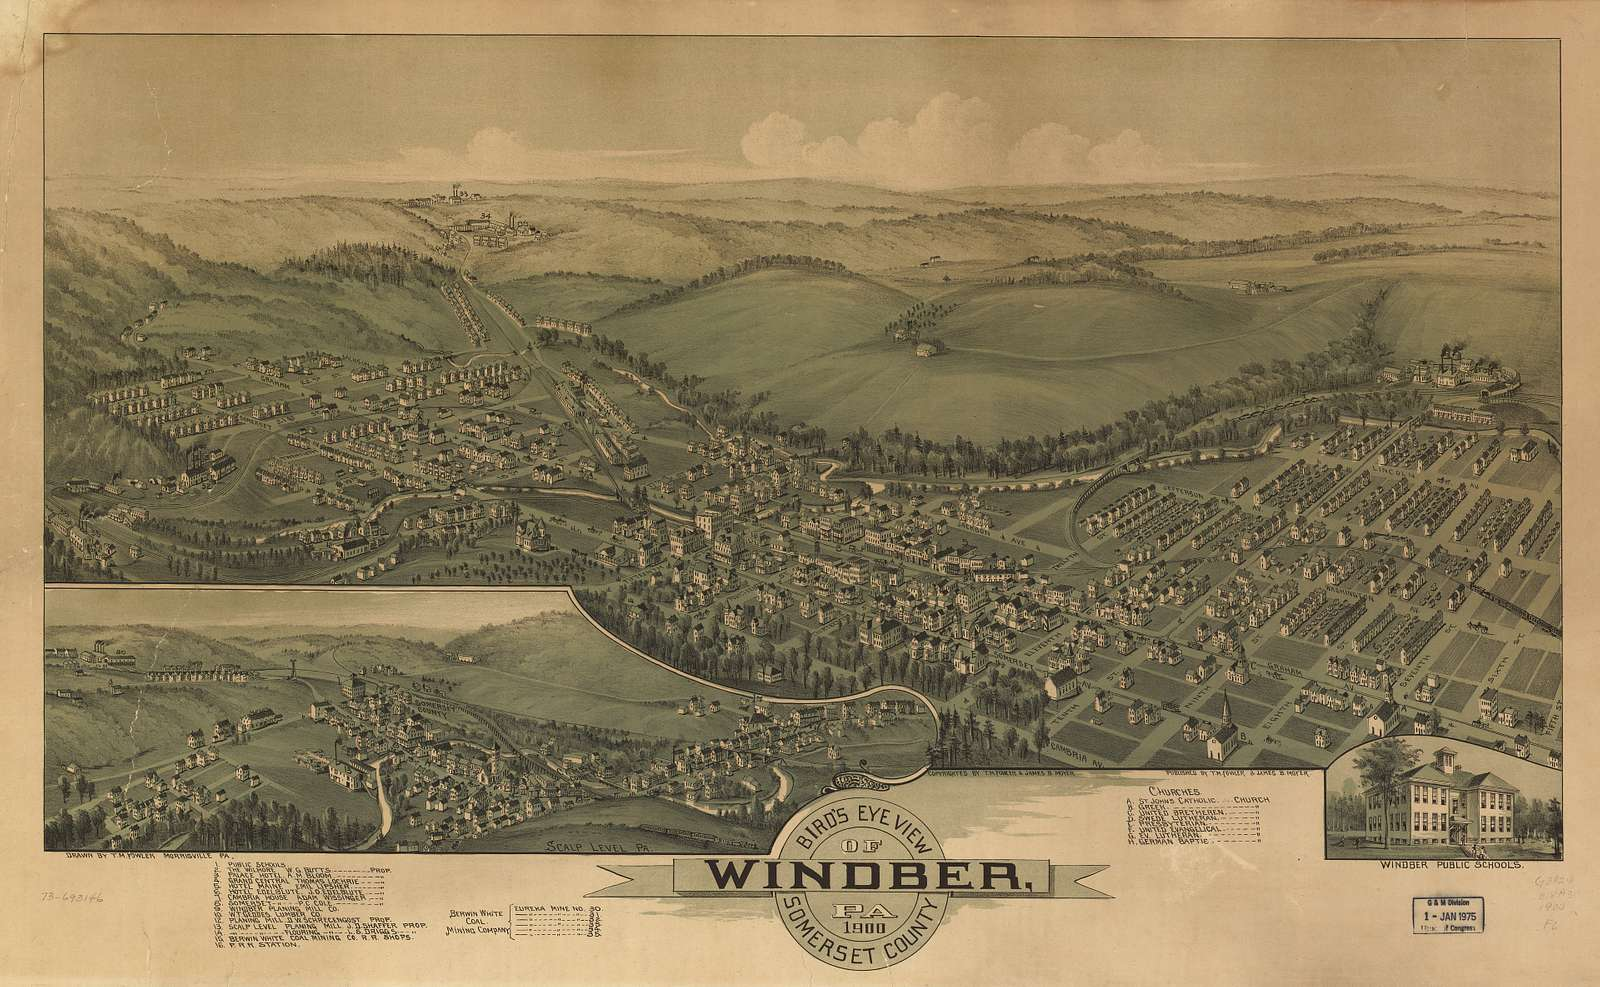 Bird's eye view of Windber, Pa. Somerset County 1900.